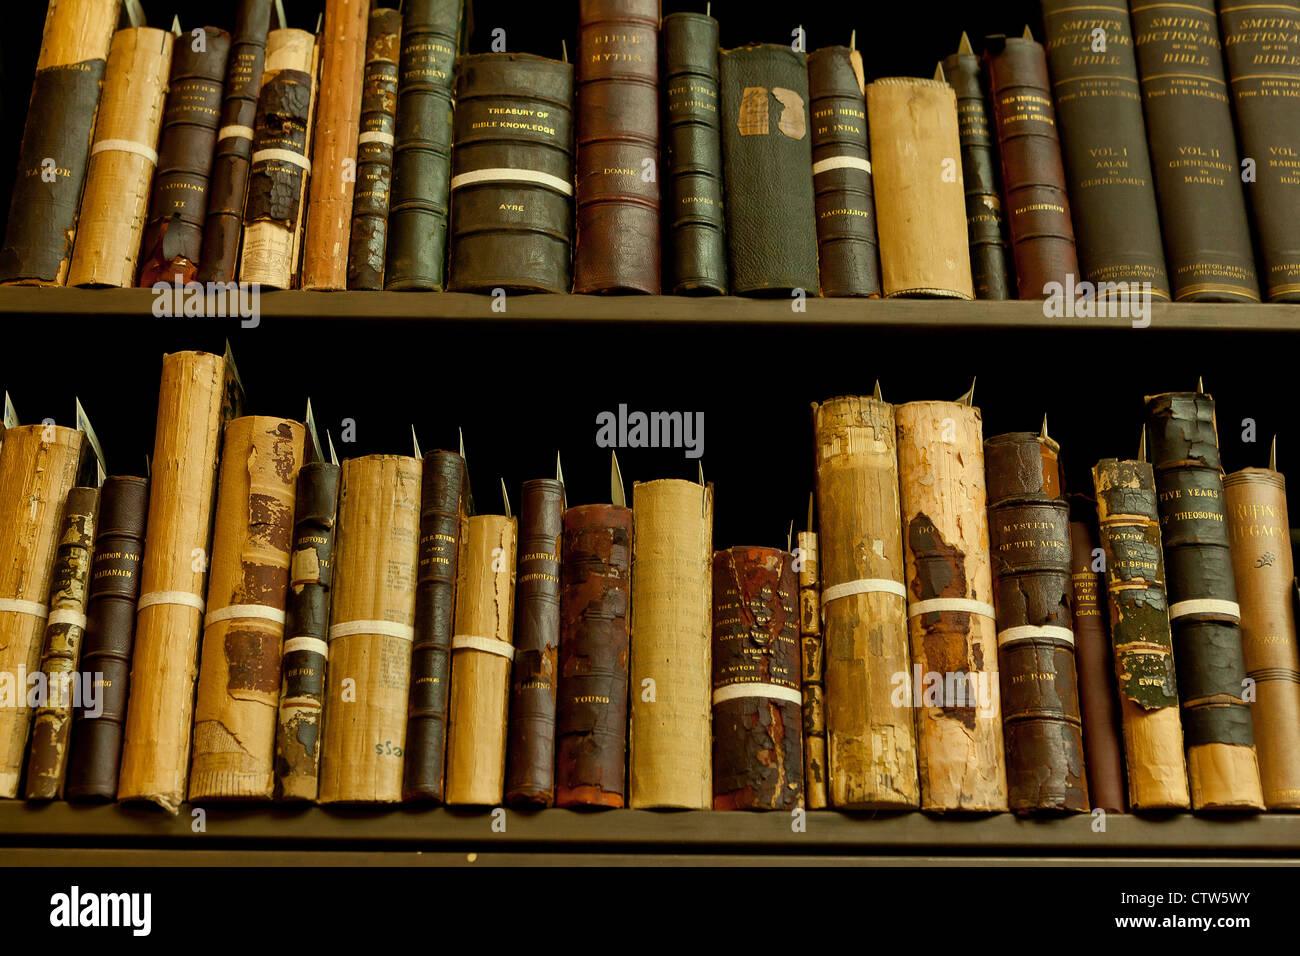 Antique books on shelf - Stock Image